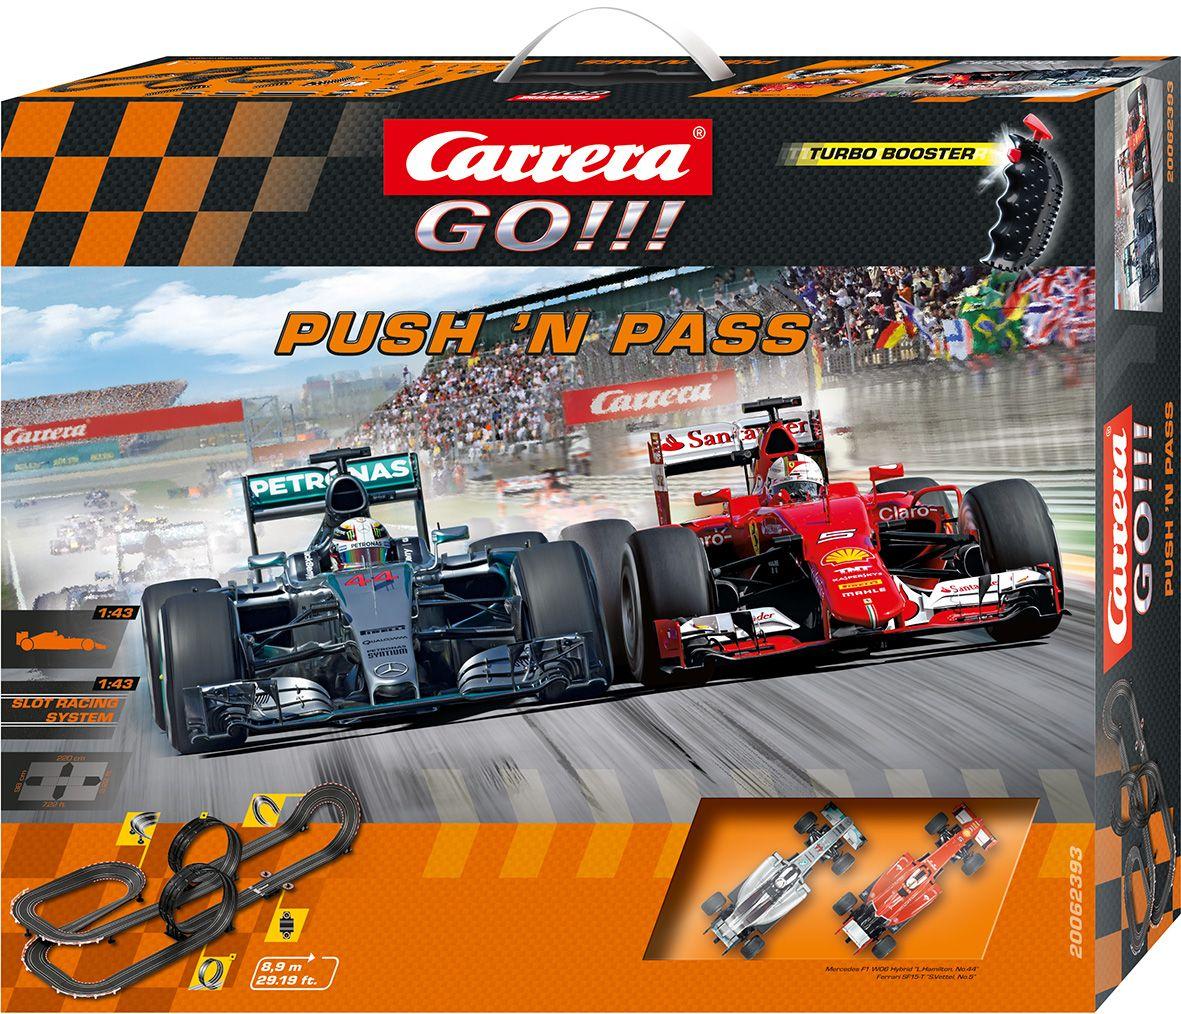 CARRERA Carrera Autorennbahn, »Carrera® GO!!! Push 'n pass«